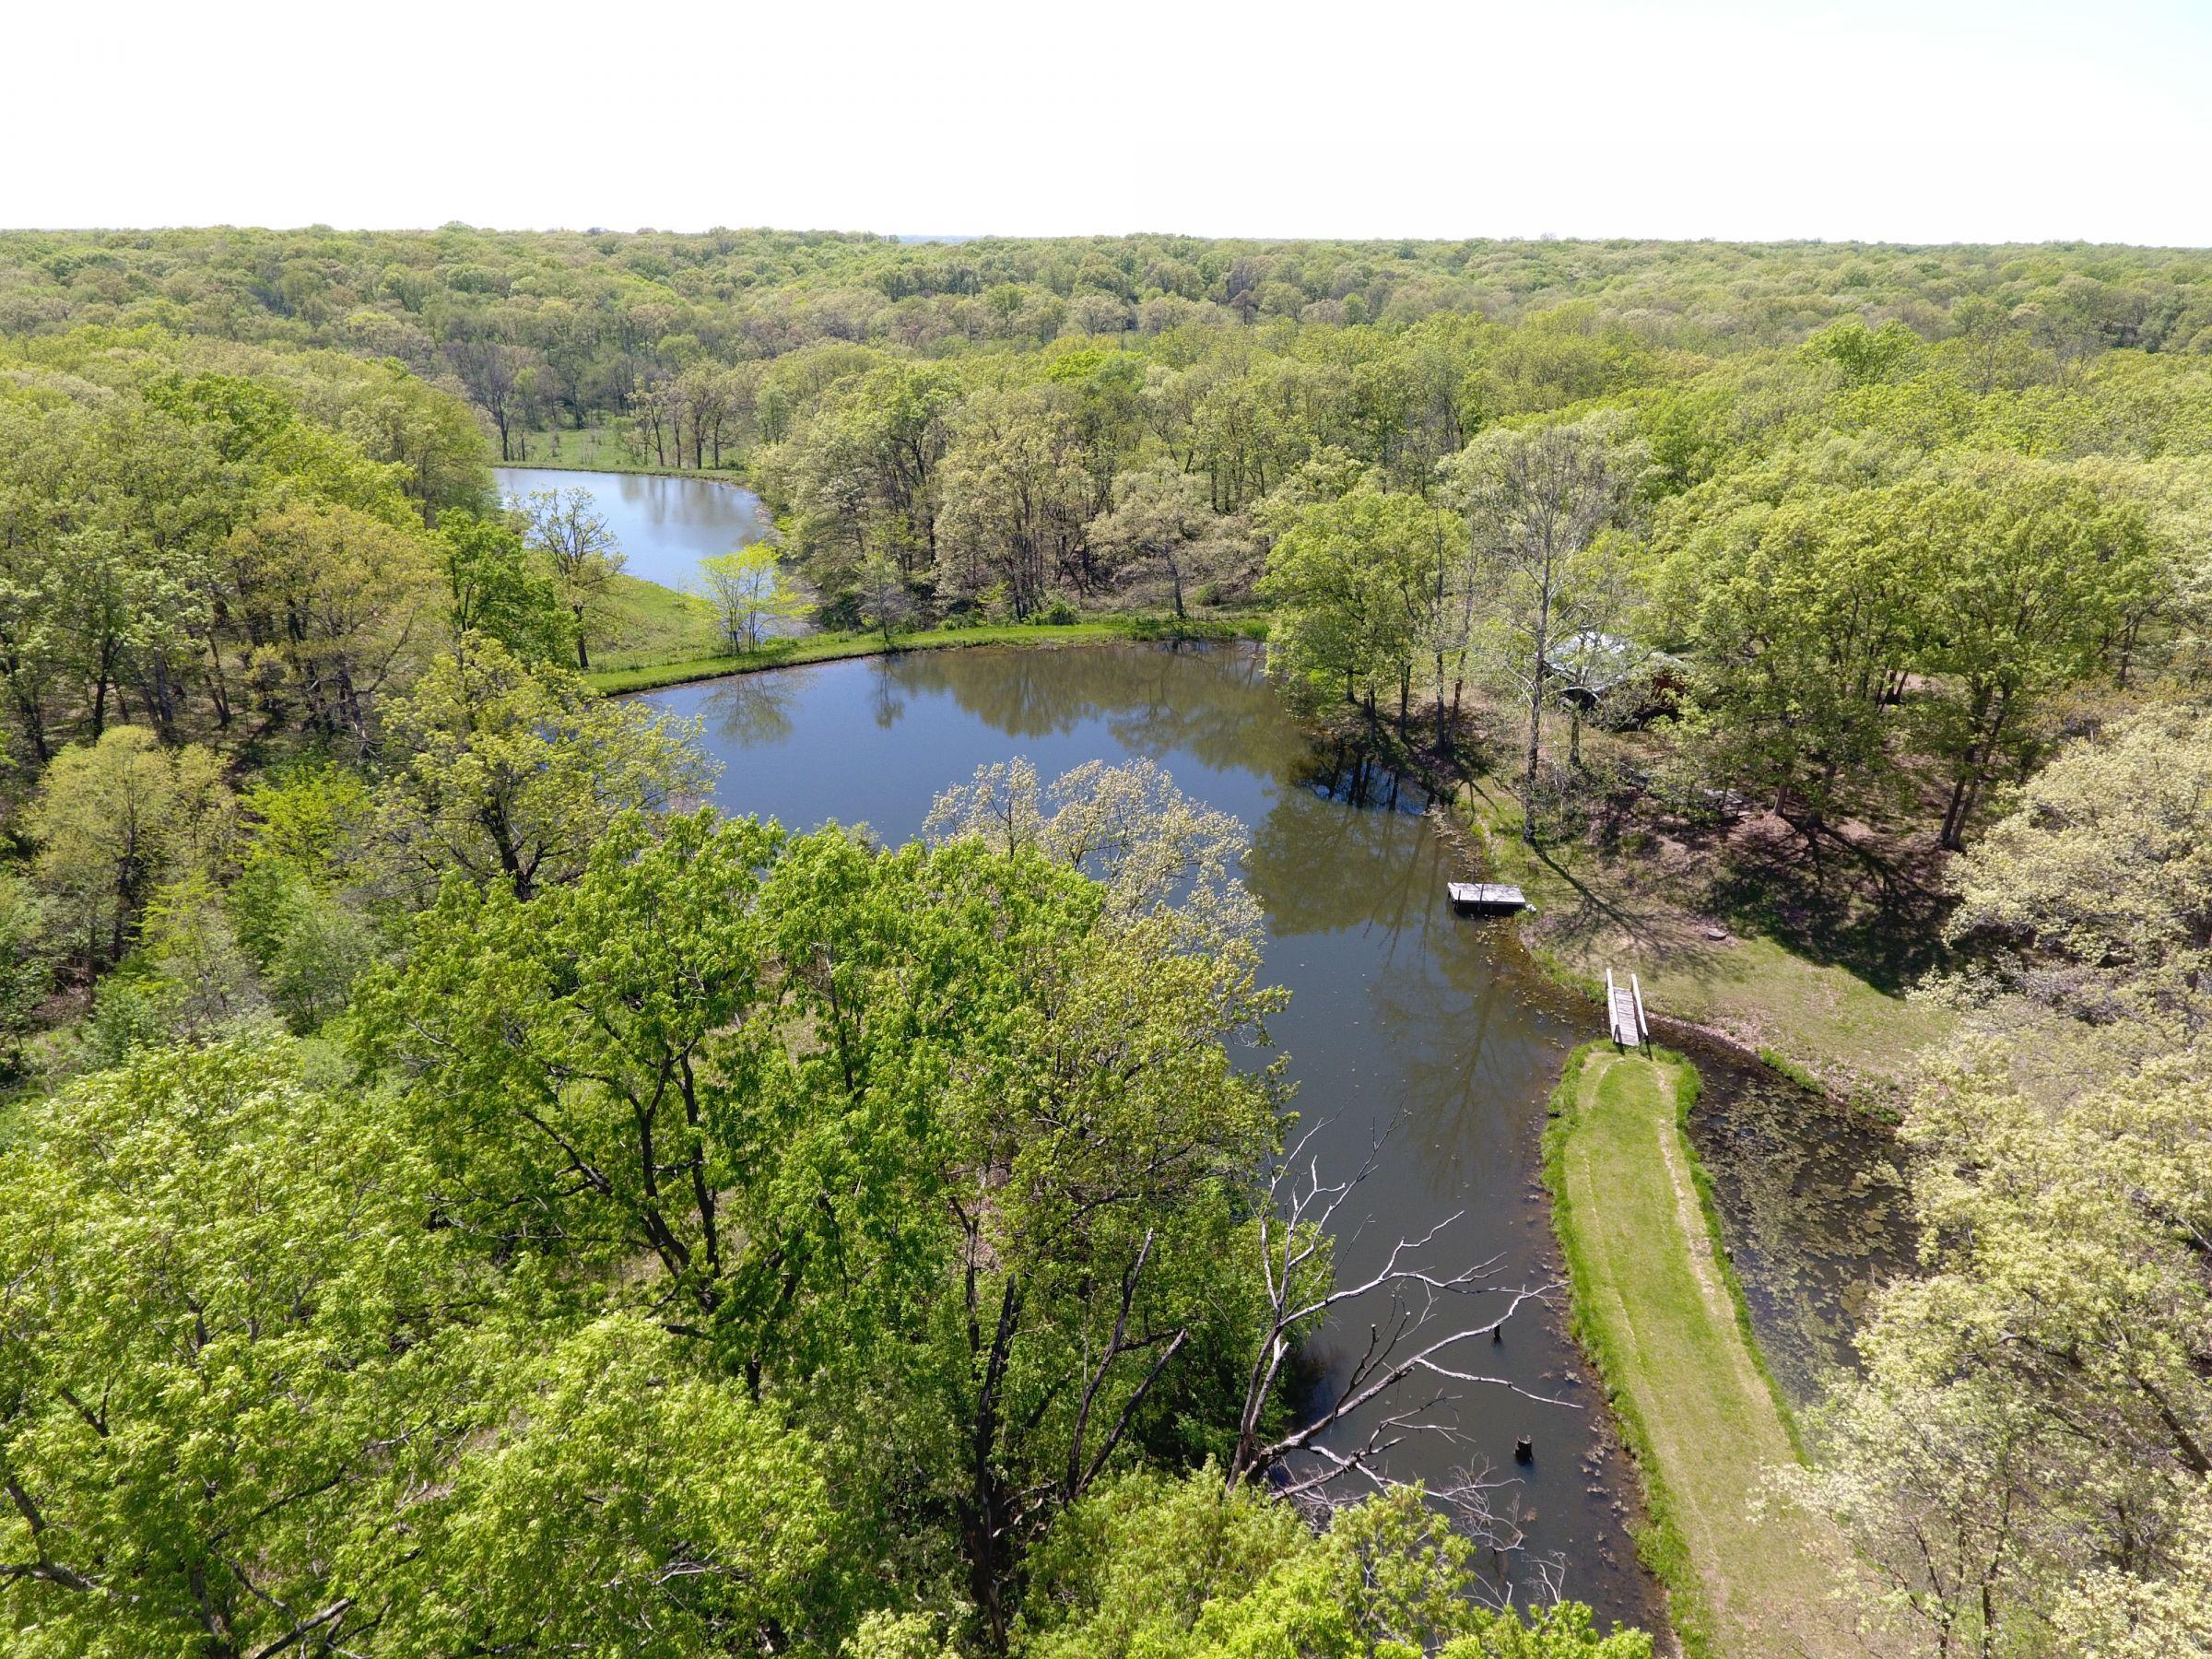 land-lee-county-iowa-340-acres-listing-number-15649-11-2021-07-21-185159.JPG